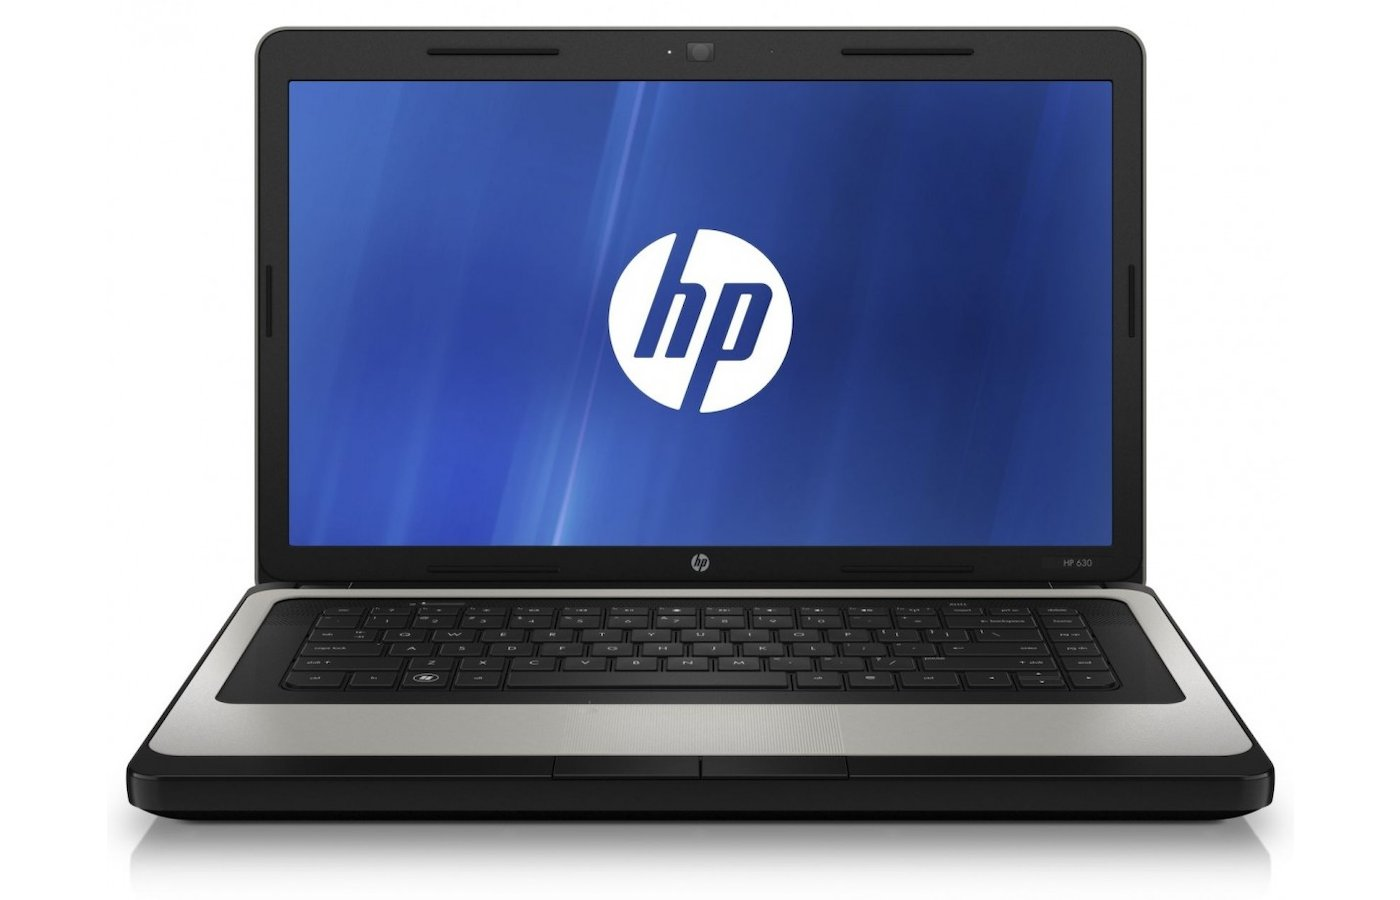 Ноутбук HP 635 E300/2Gb/320Gb/HD6310/DVDRW/15.6HD/WiFi/cam/bag/Linux